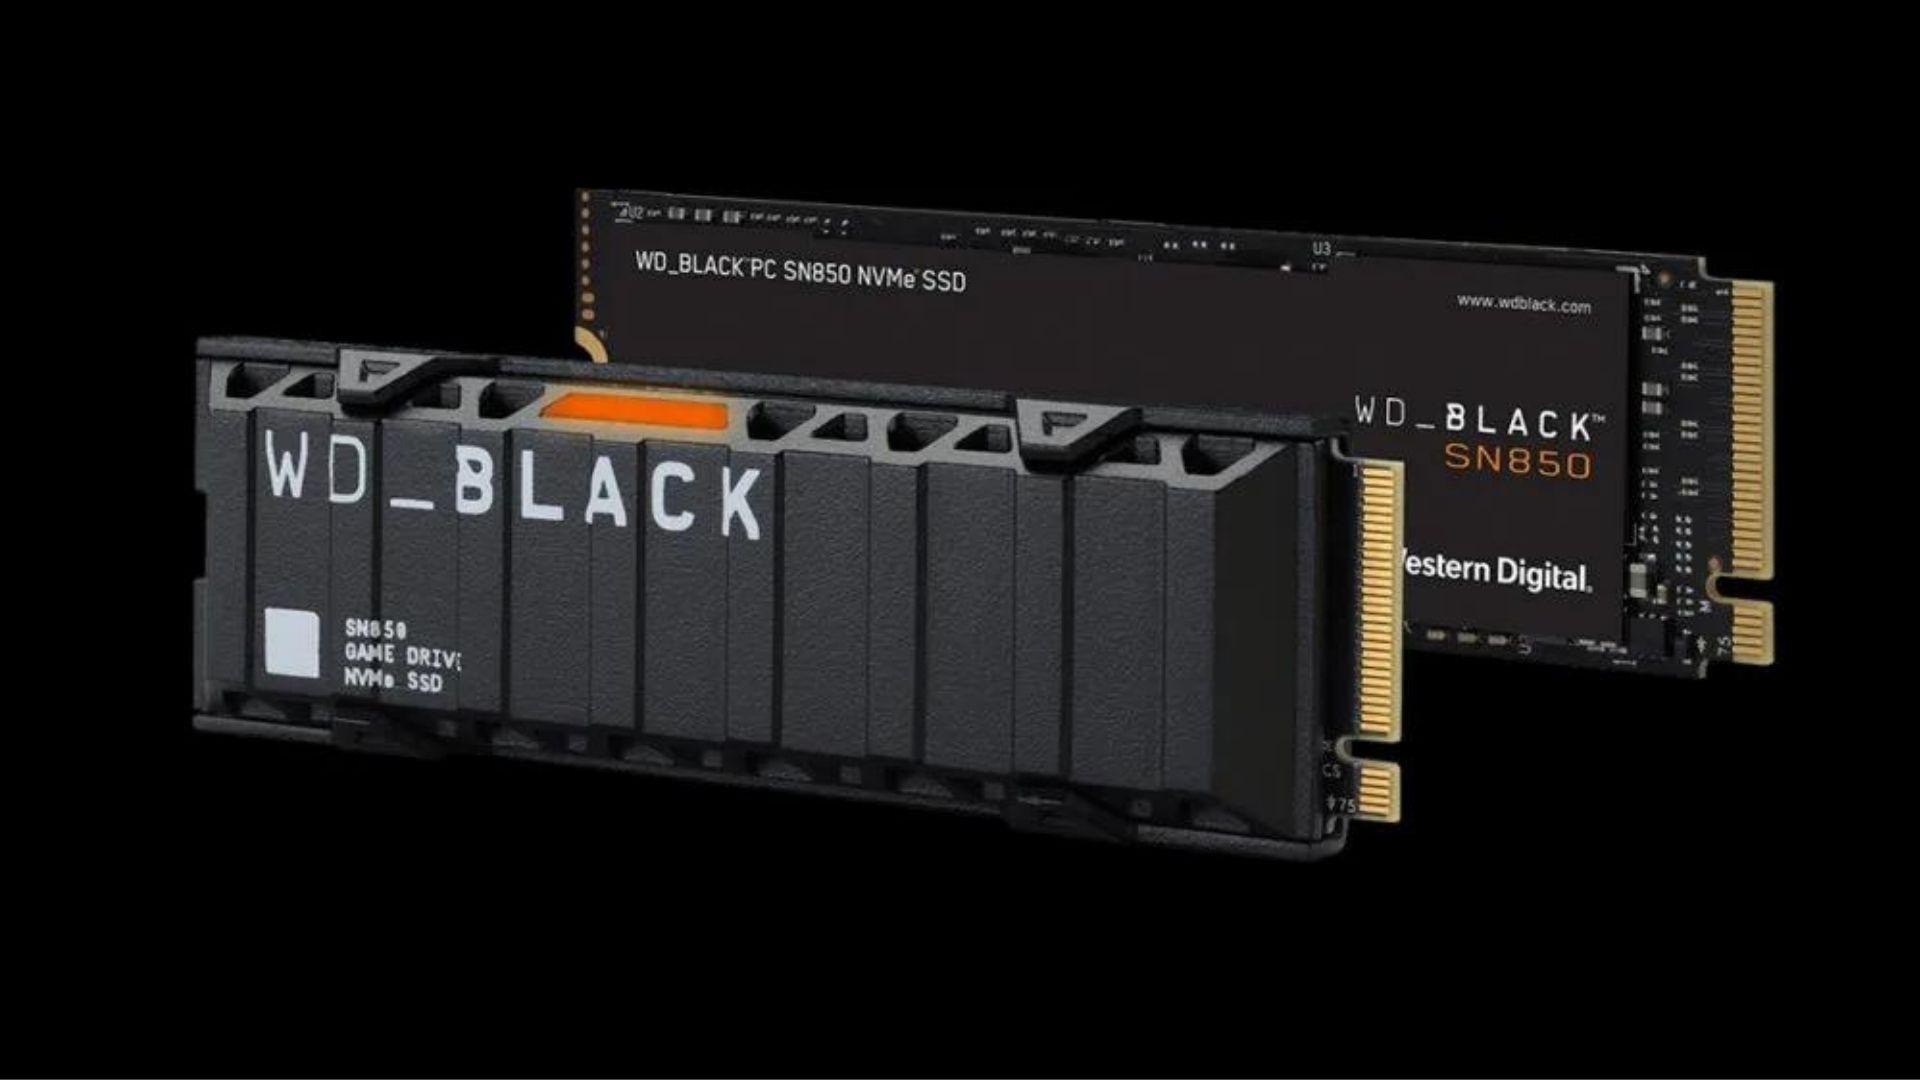 wd-black-sn850